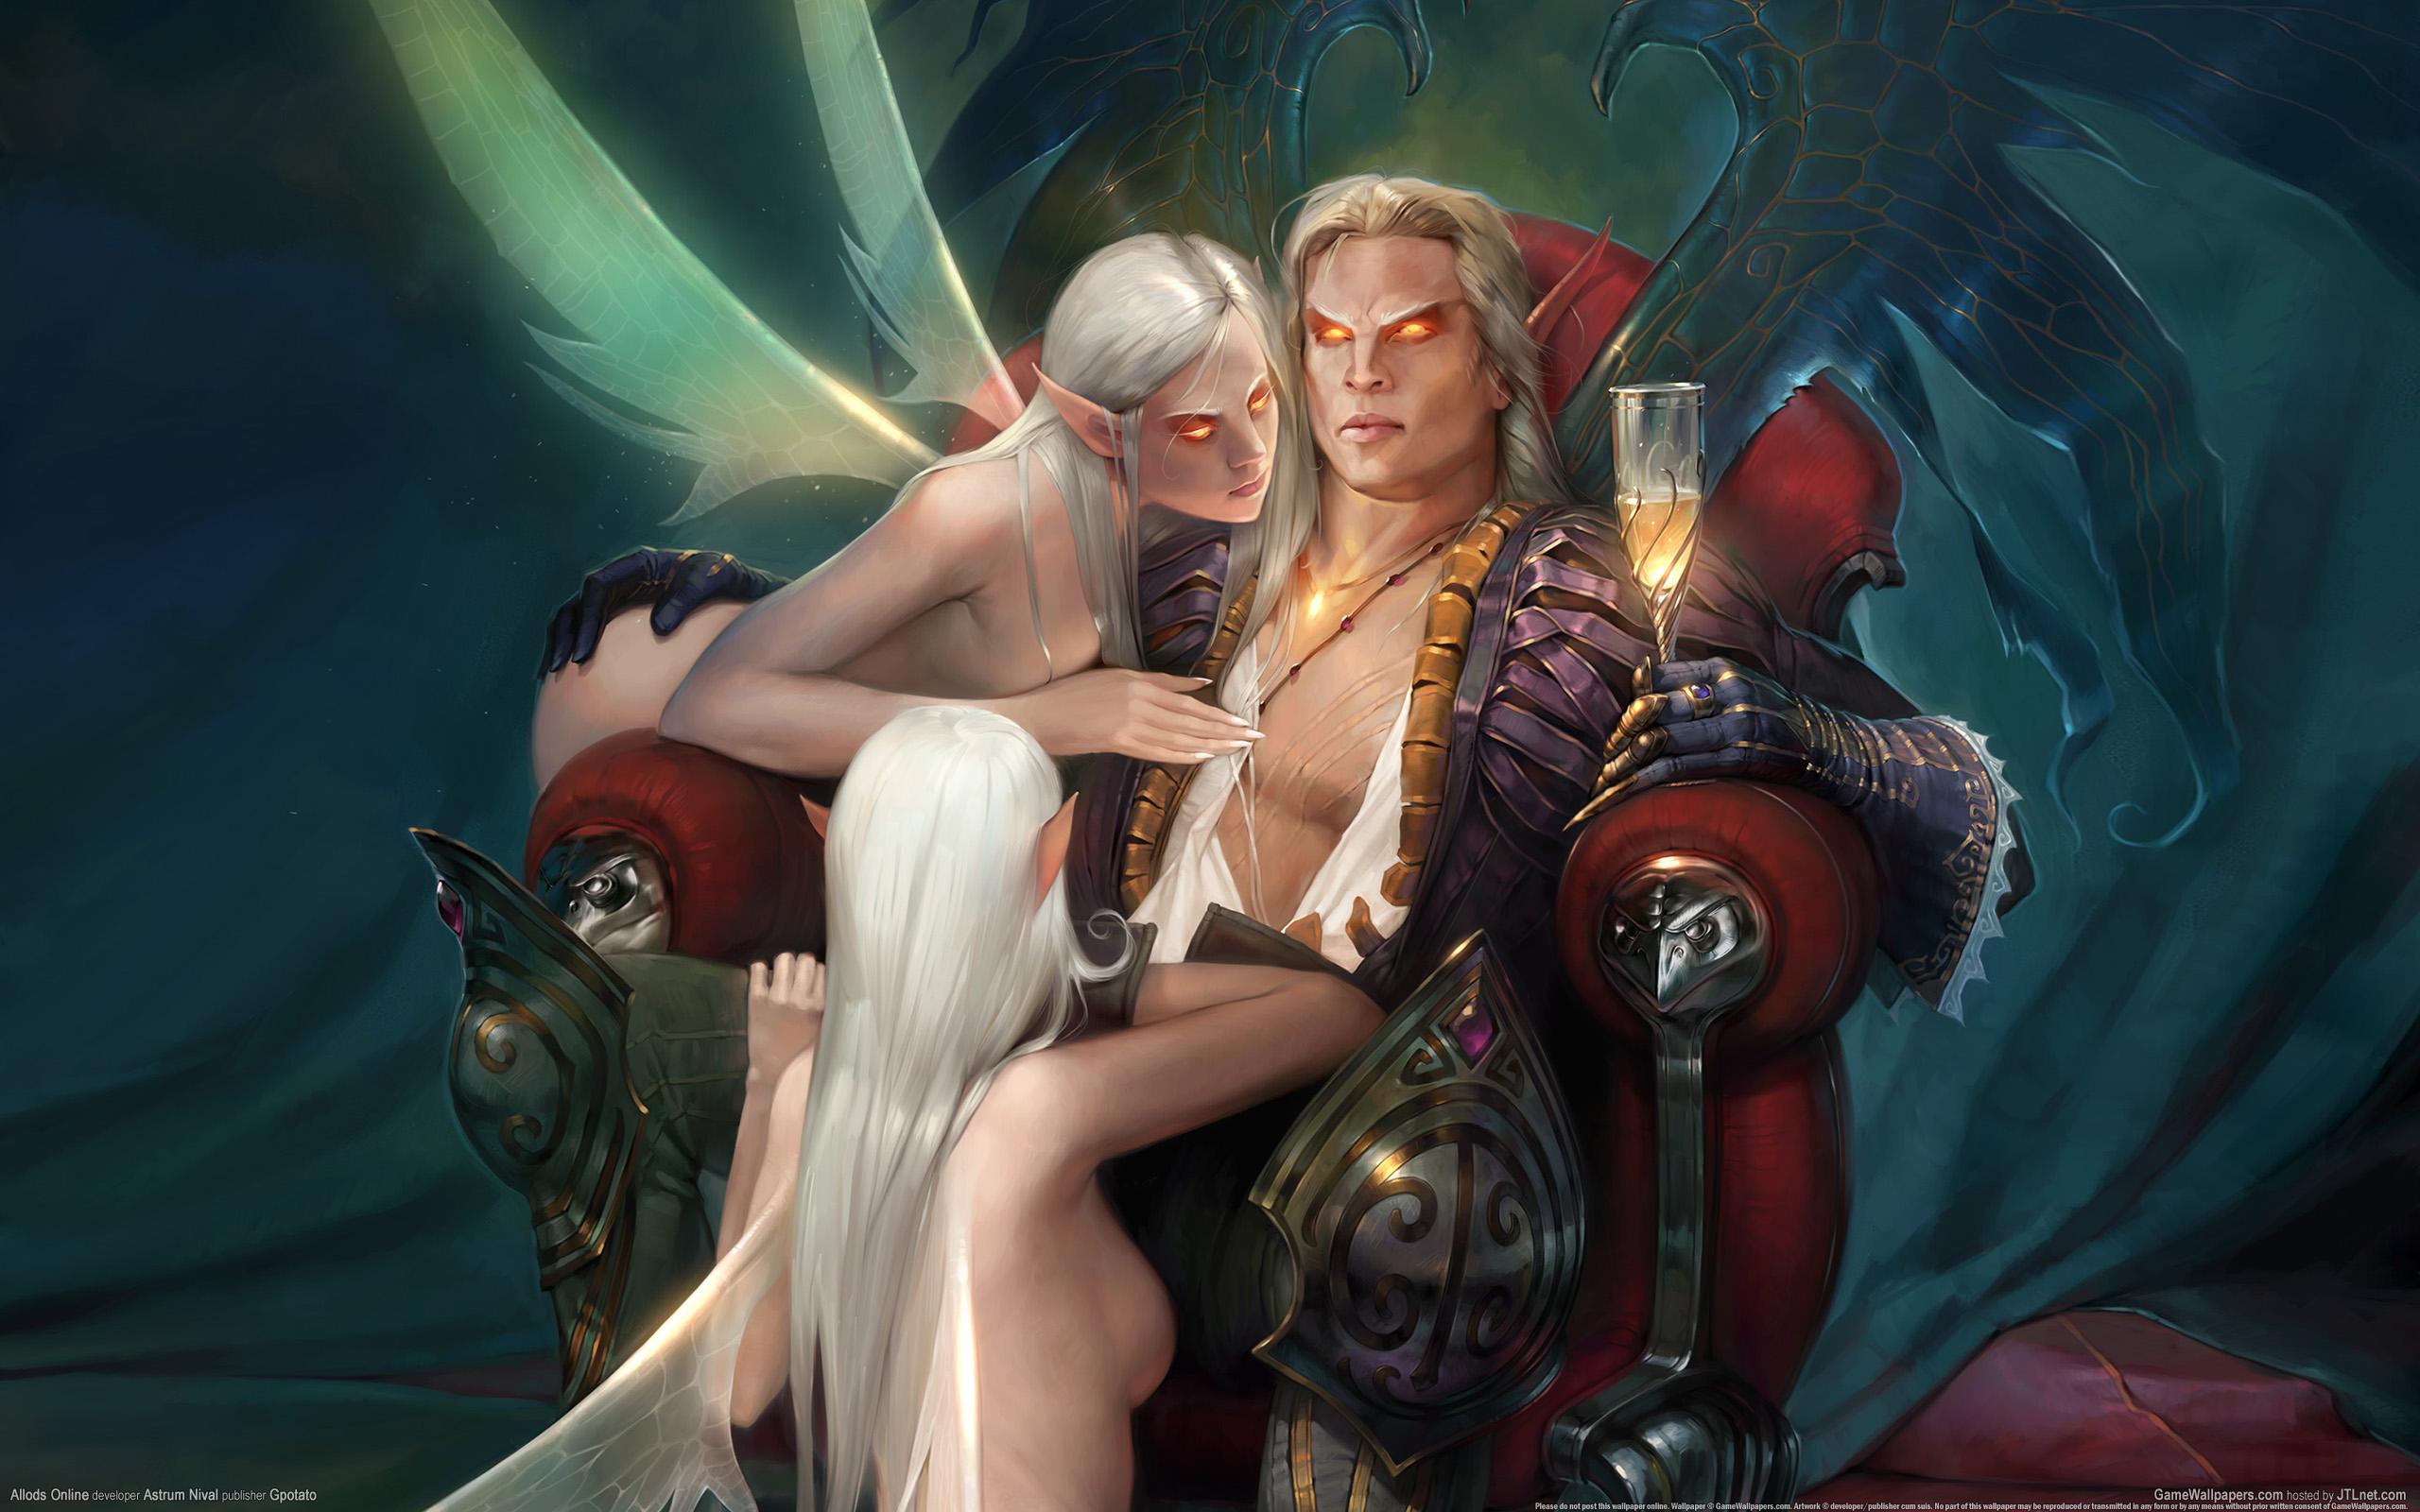 igri-onlayn-s-seks-personazhami